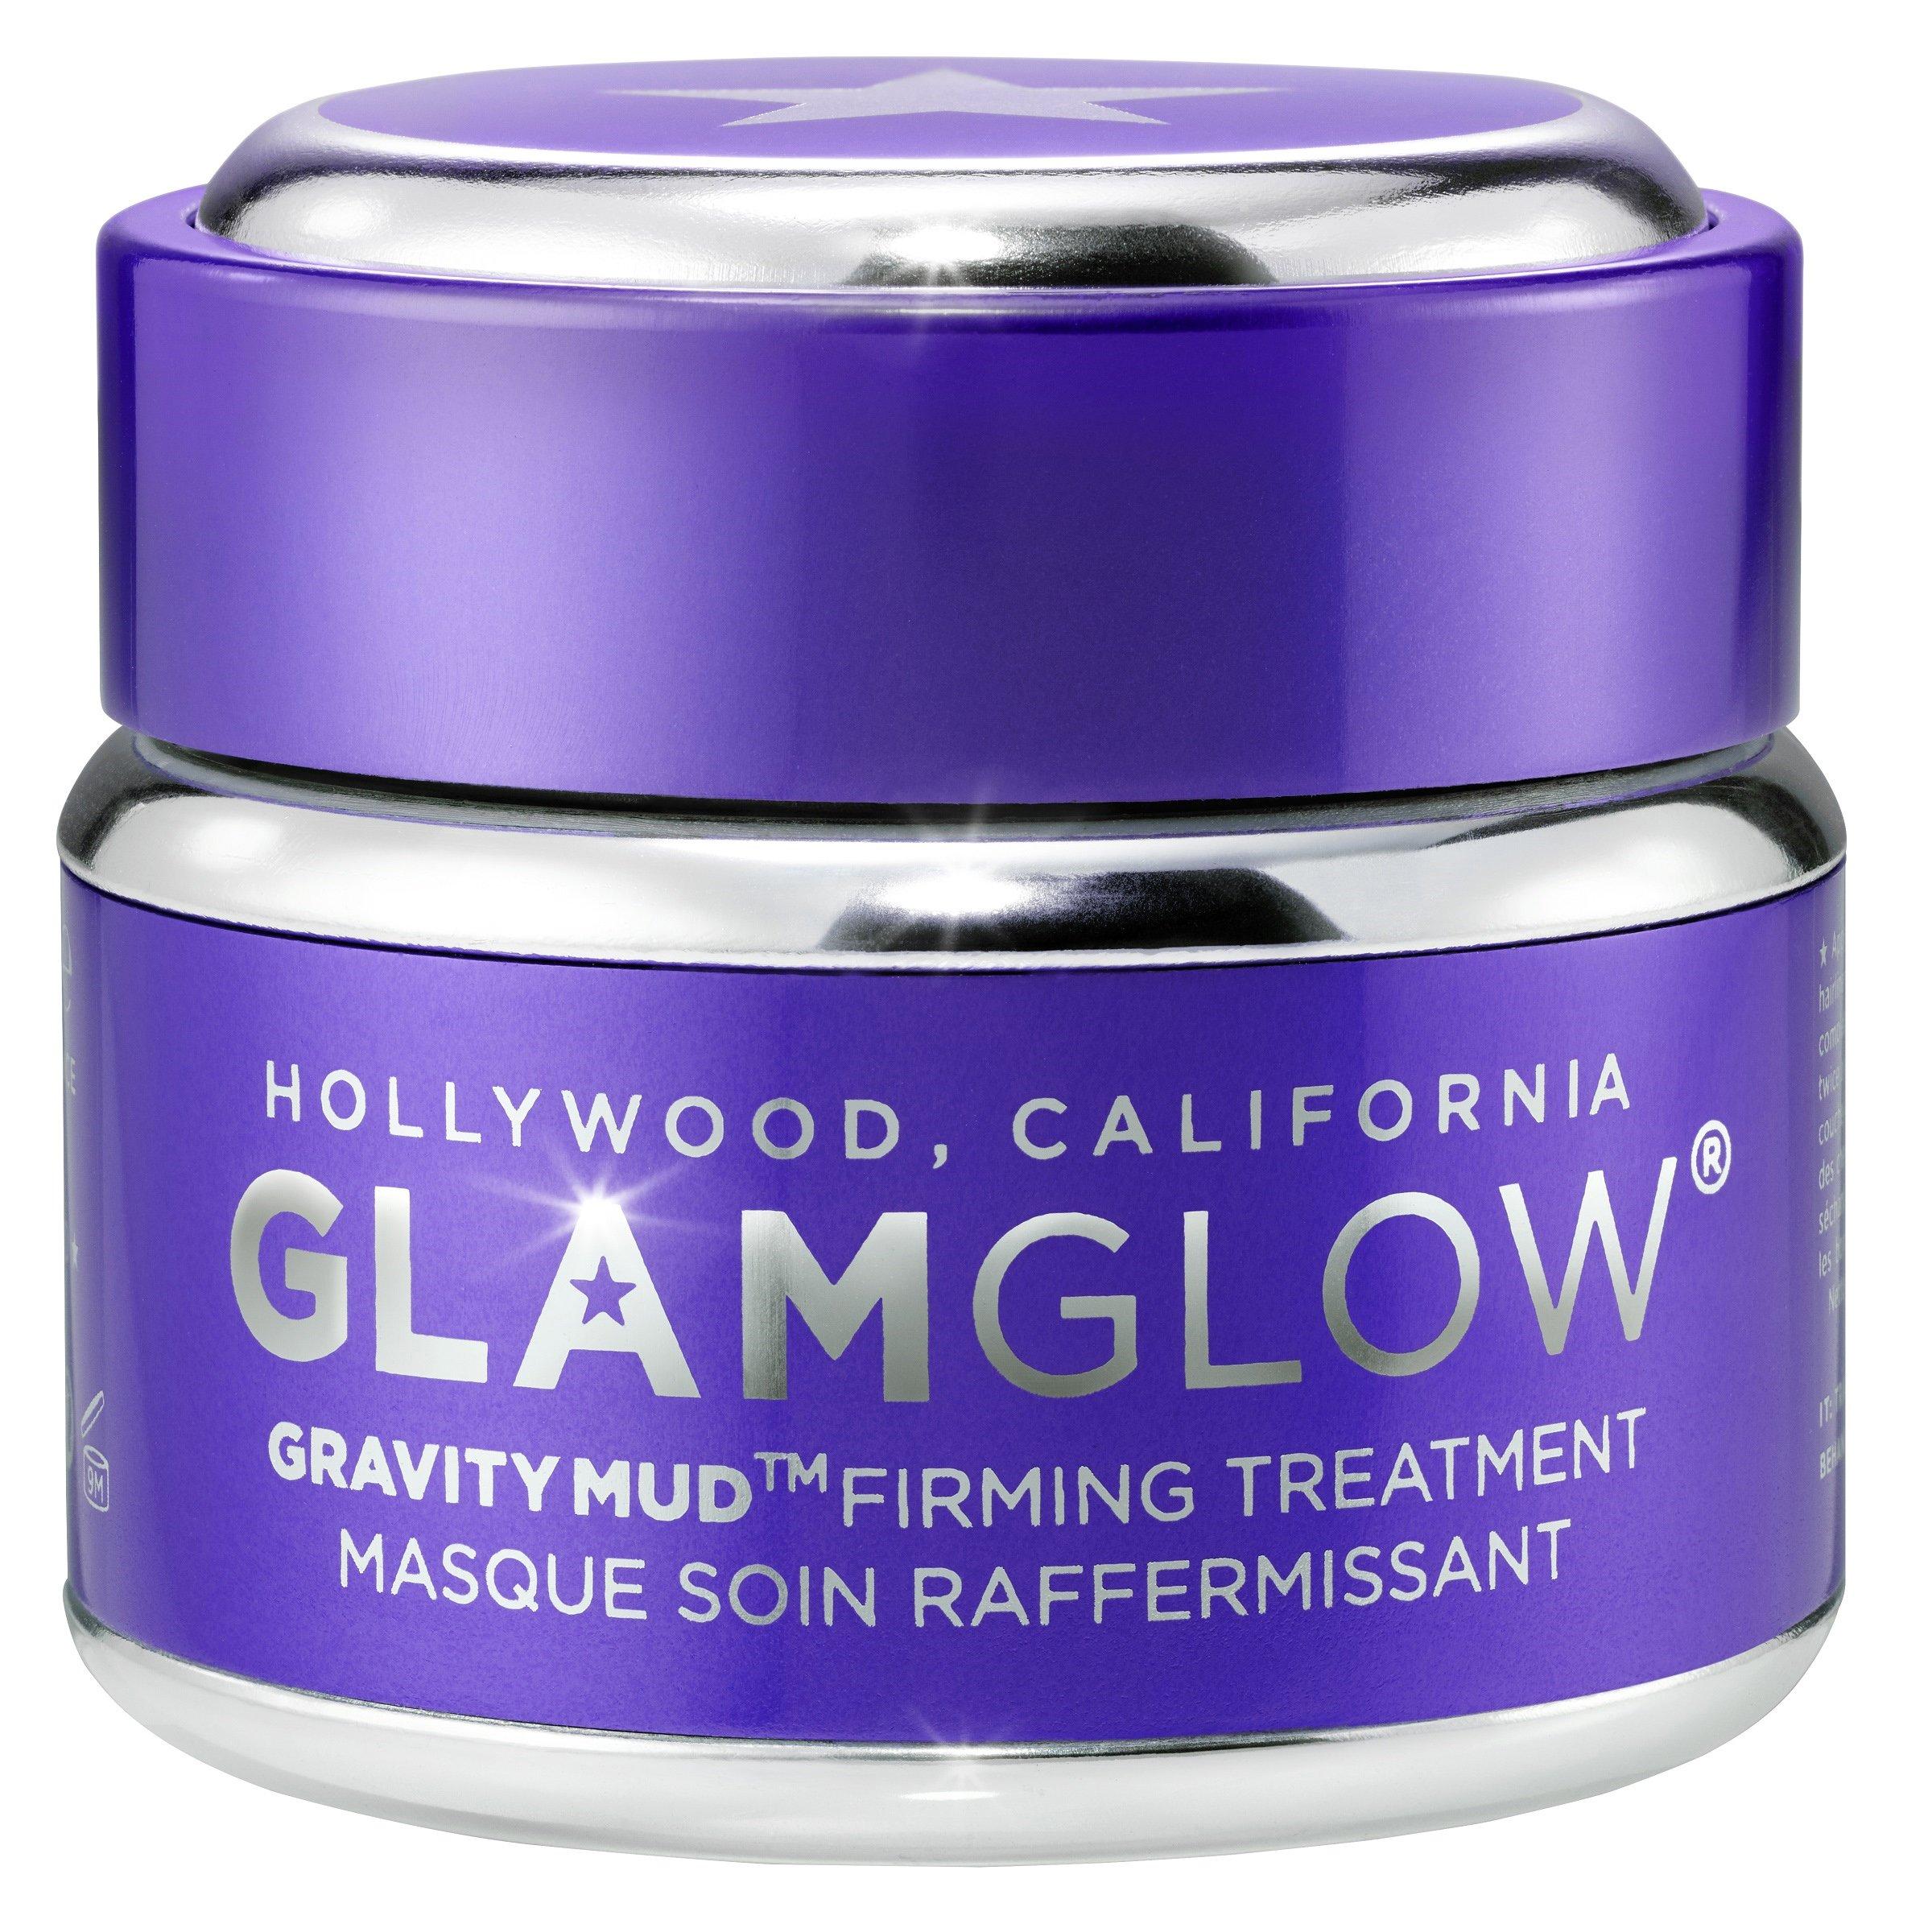 Glambox Gravitymud Firming Treatment Mask Μάσκα Συσφίγγει Λειαίνει και Τονώνει την Επιδερμίδα 50gr